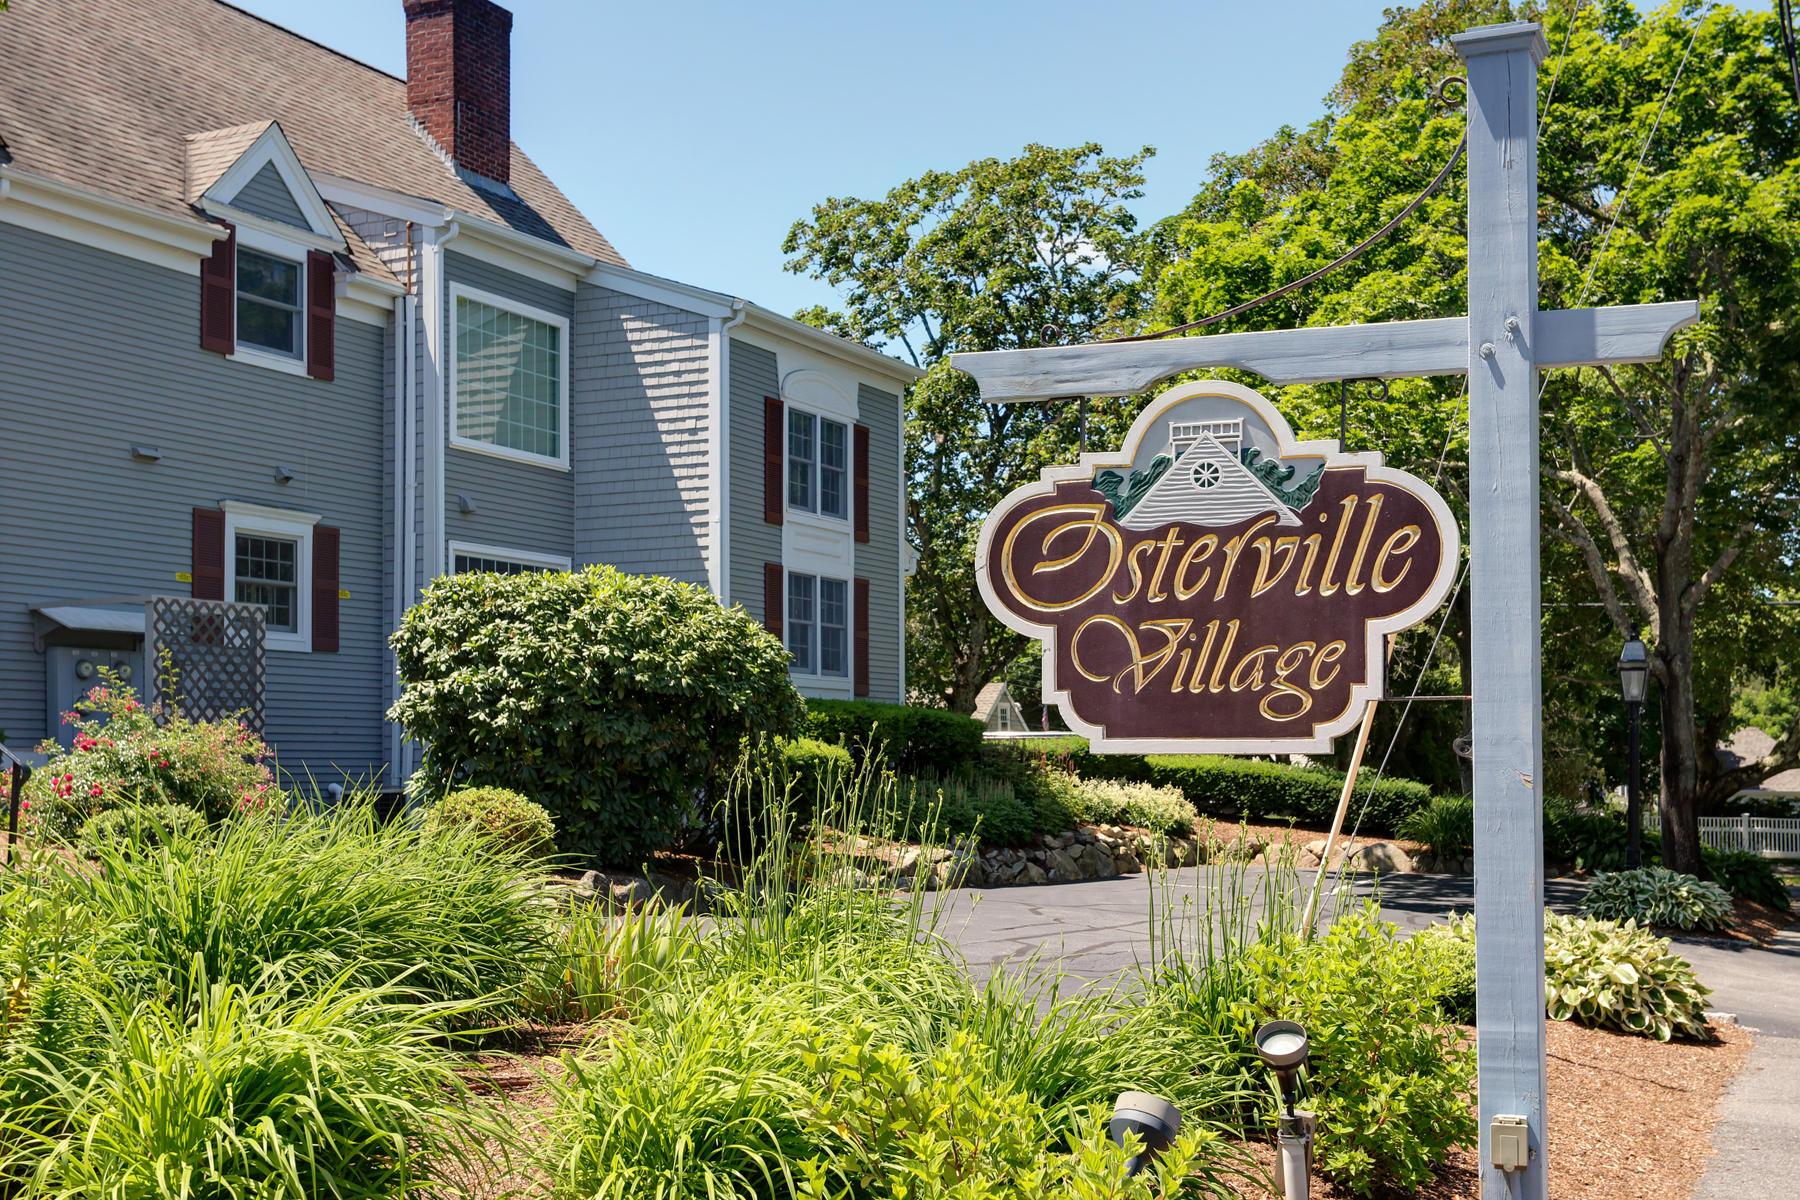 920-main-street-osterville